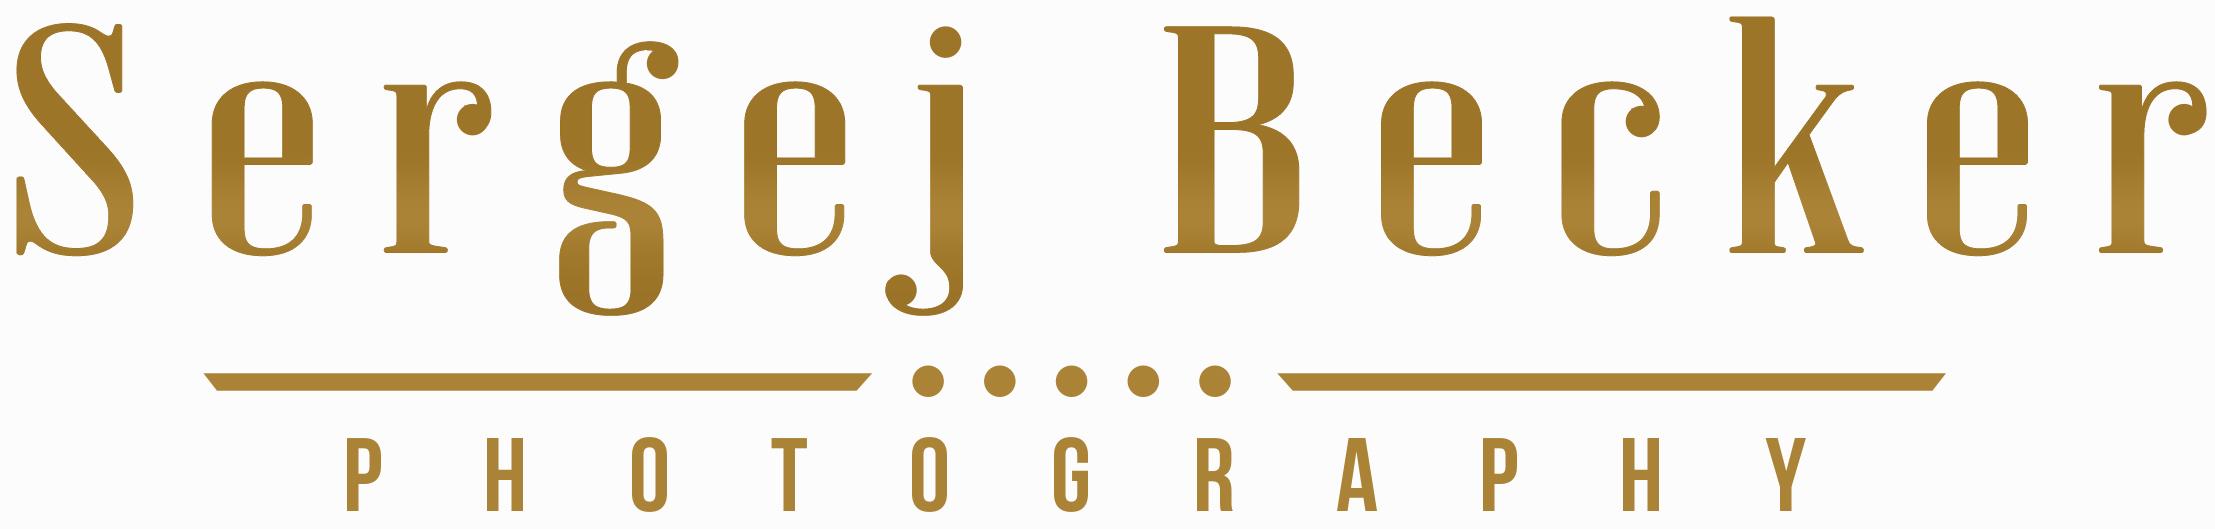 SB Logo 2020 02 Dicker